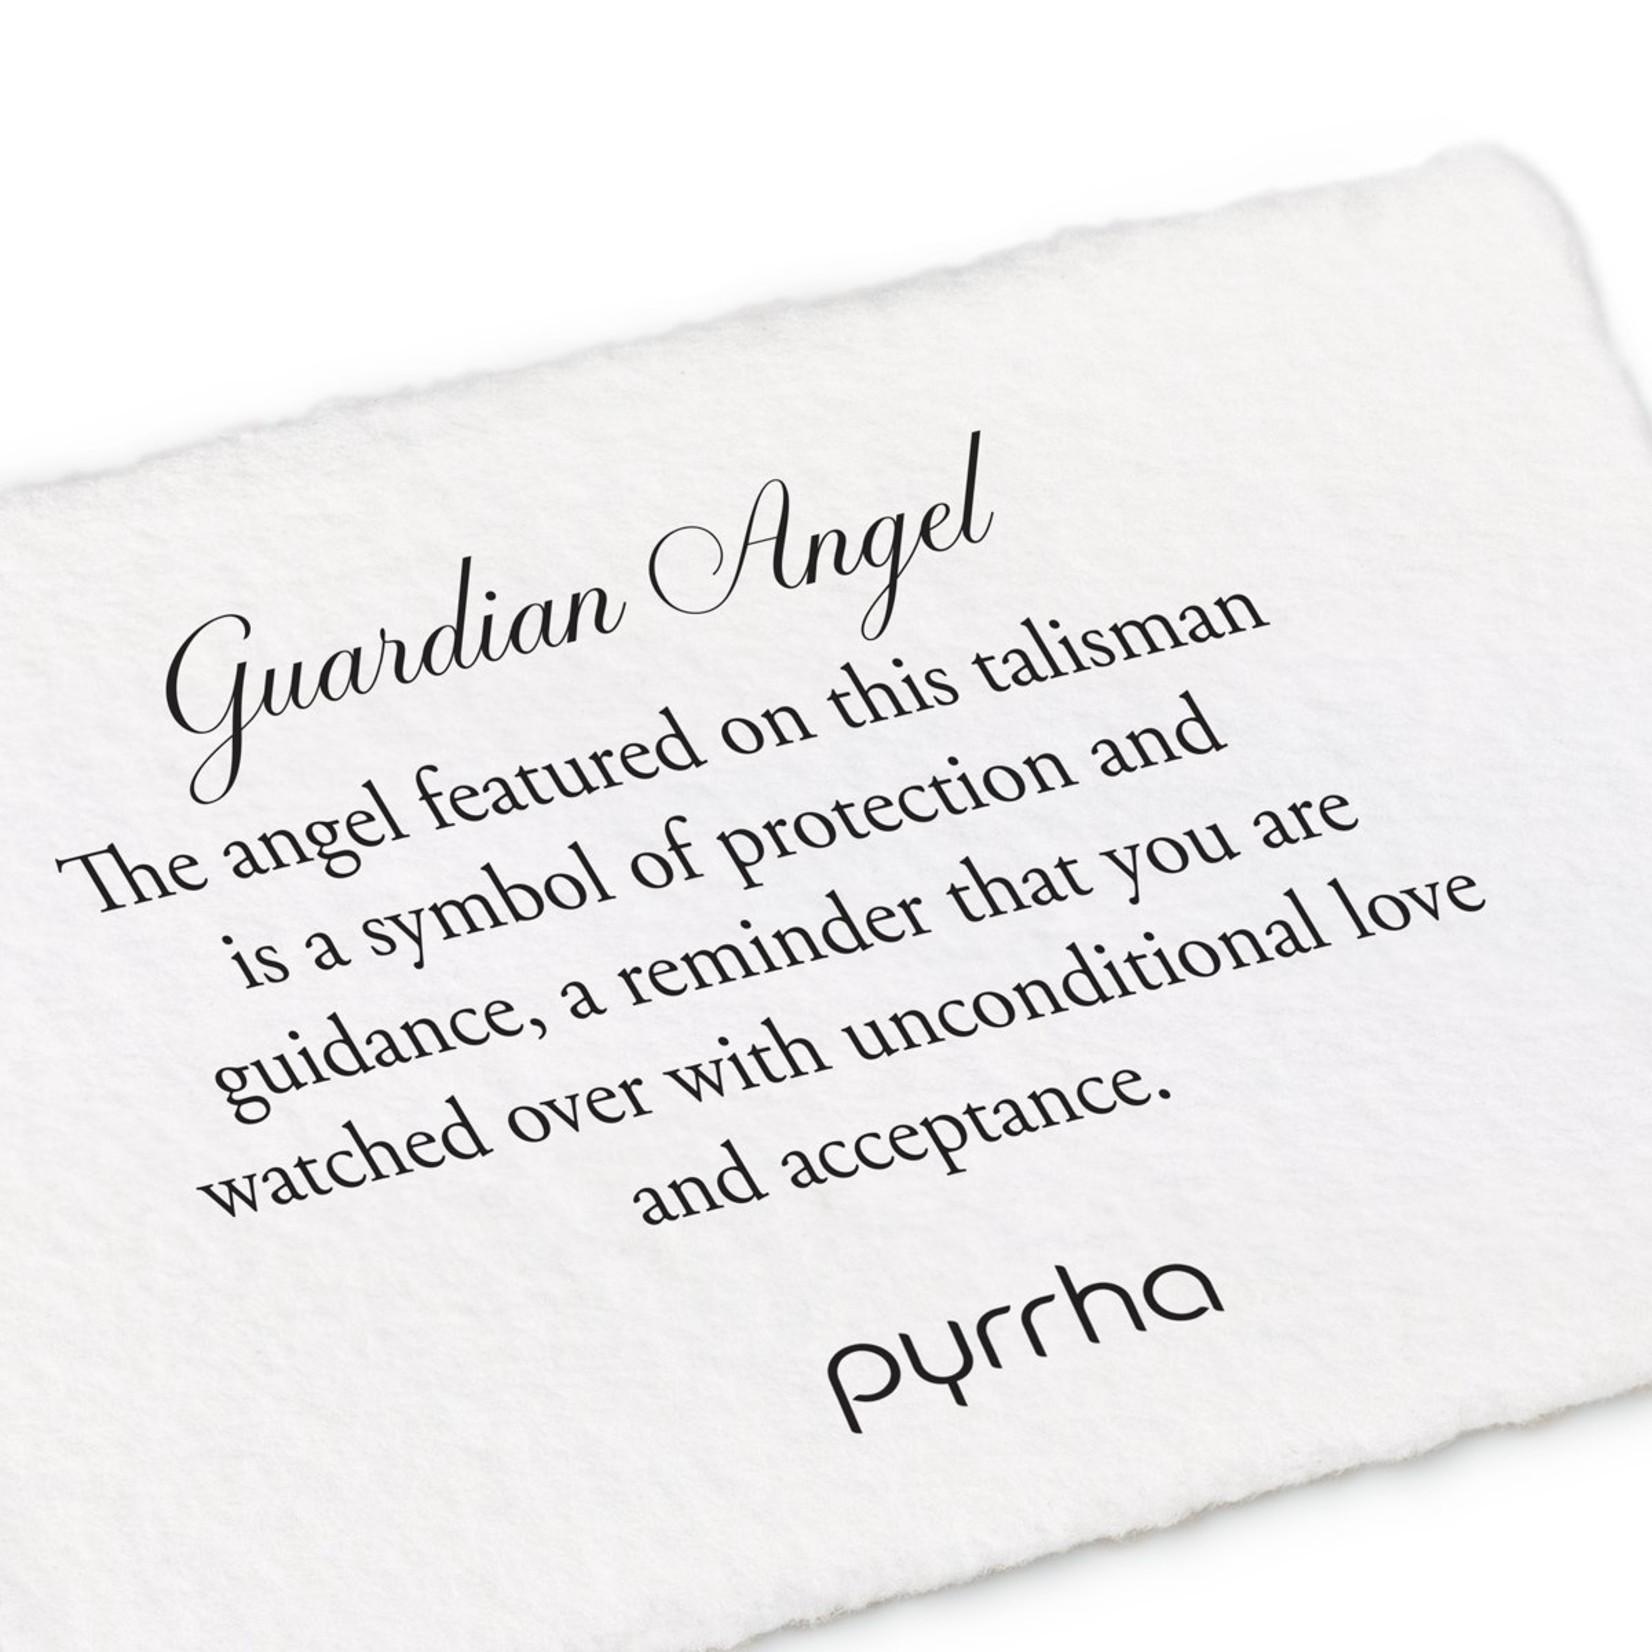 Pyrrha Guardian Angel Signature Talisman